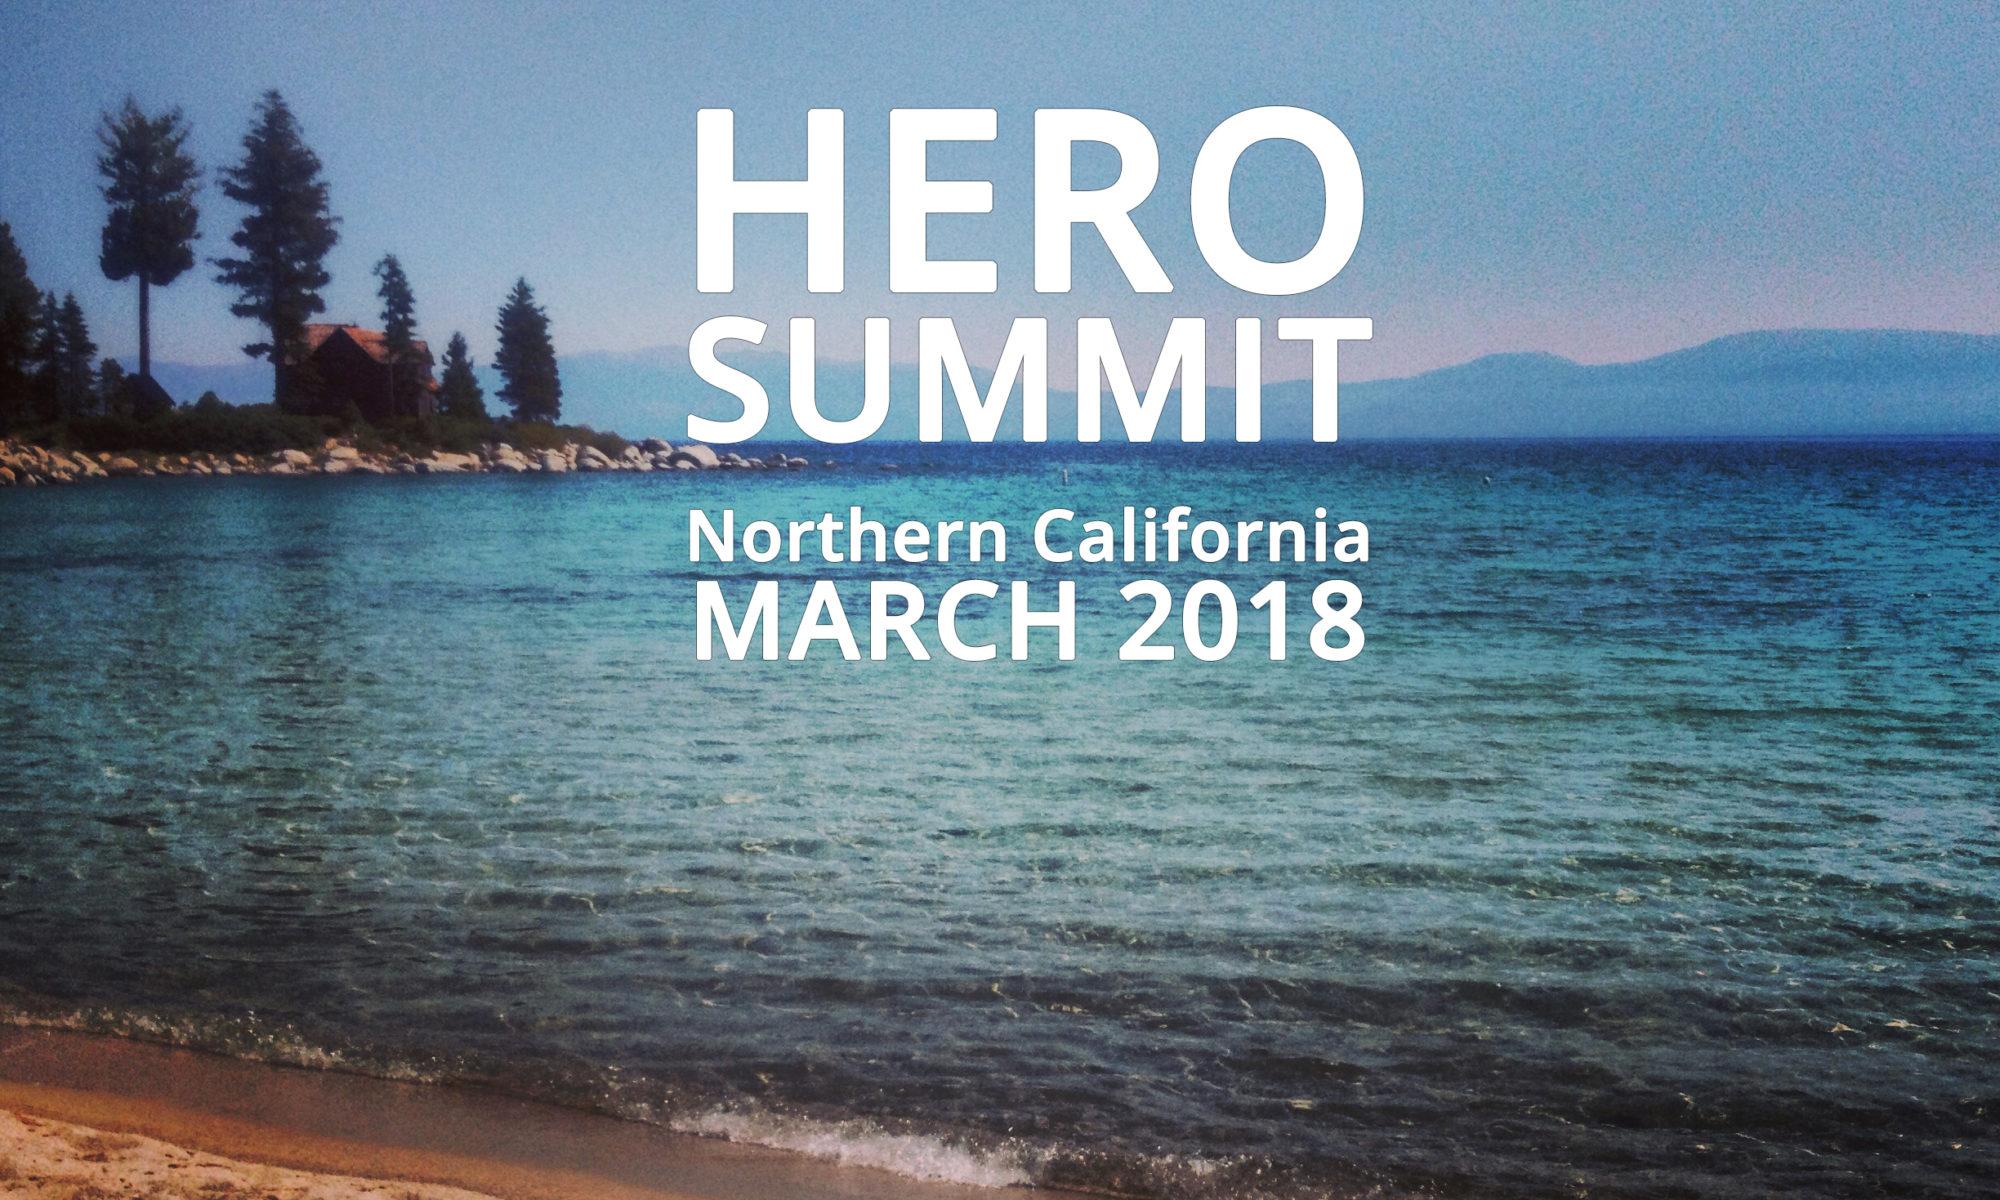 HERO Summit Lake Tahoe conference